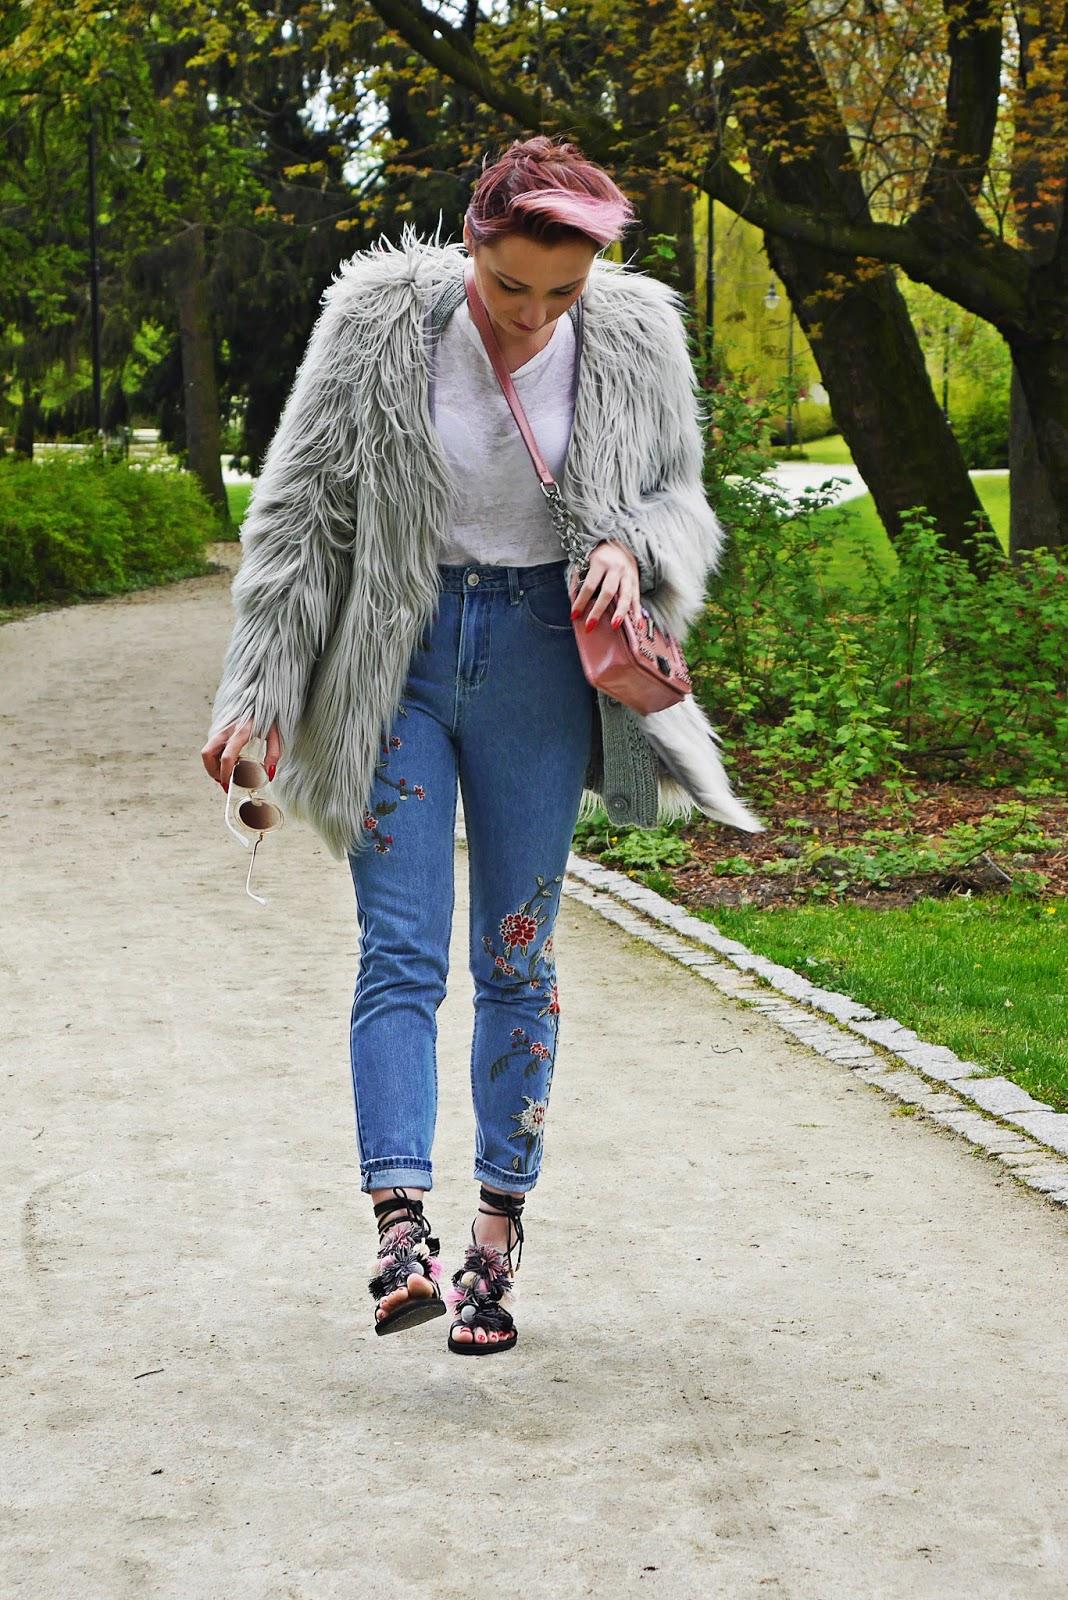 pompon_sandals_dresslily_ootd_look_karyn_blog_gray_fur_mama_jeans_020517d